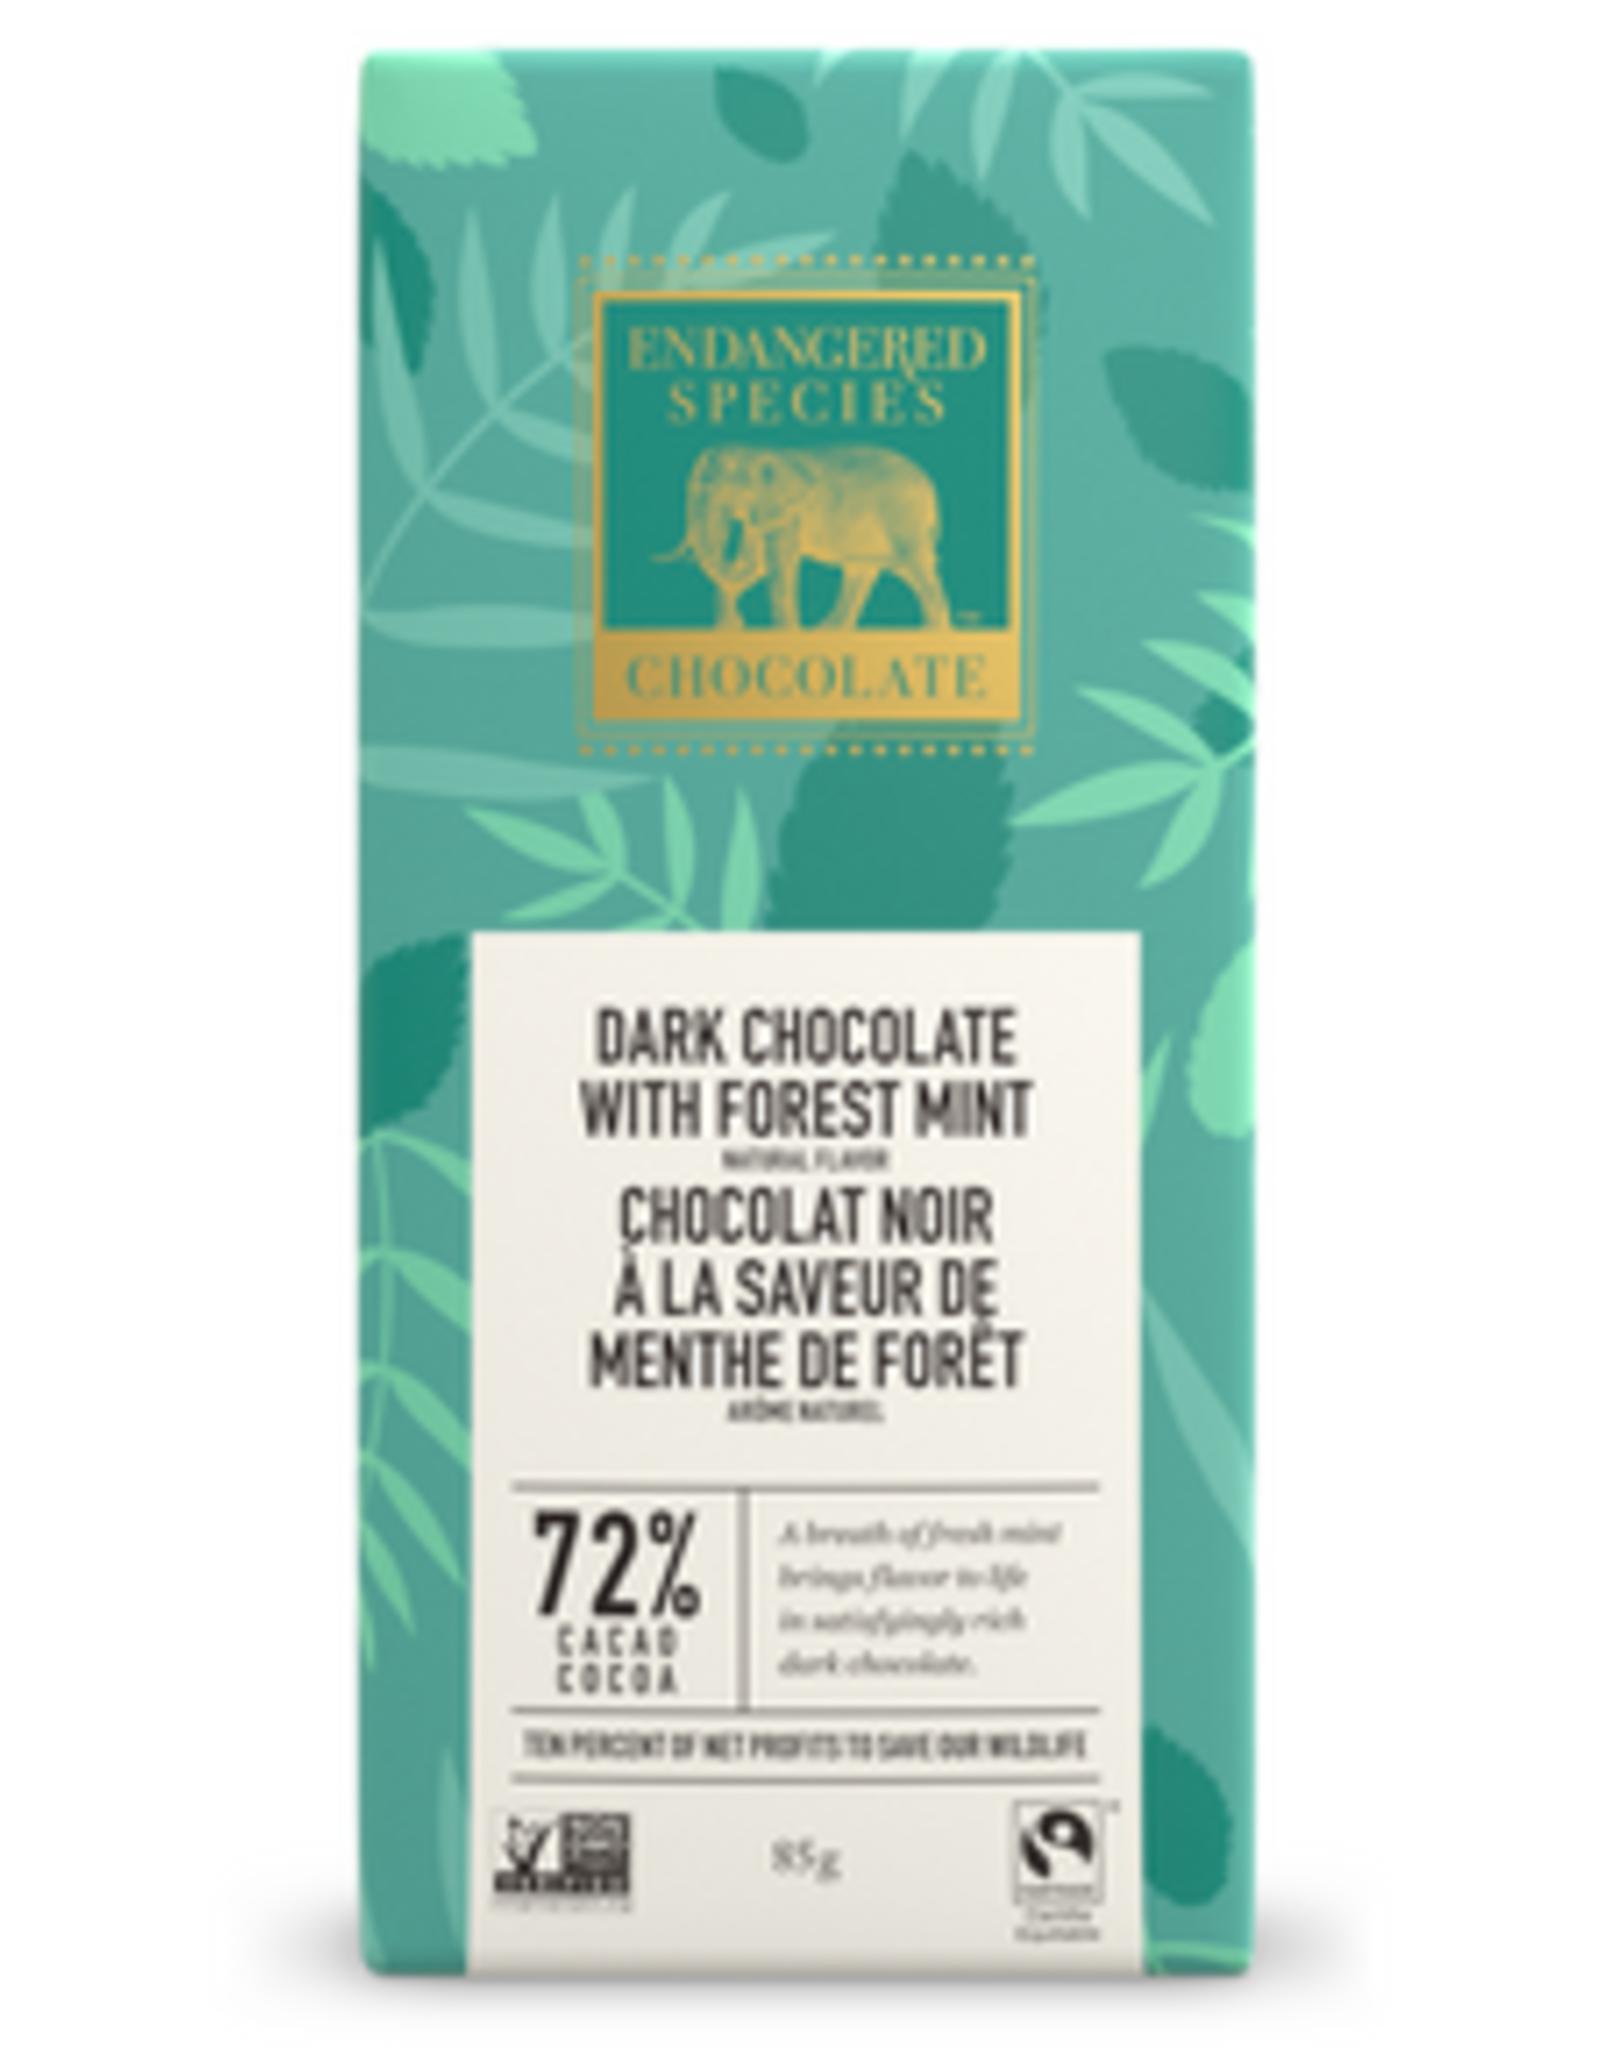 Endangered Species Endangered Species - Tablette de Chocolat Noir, Menthe de Forêt (85g)